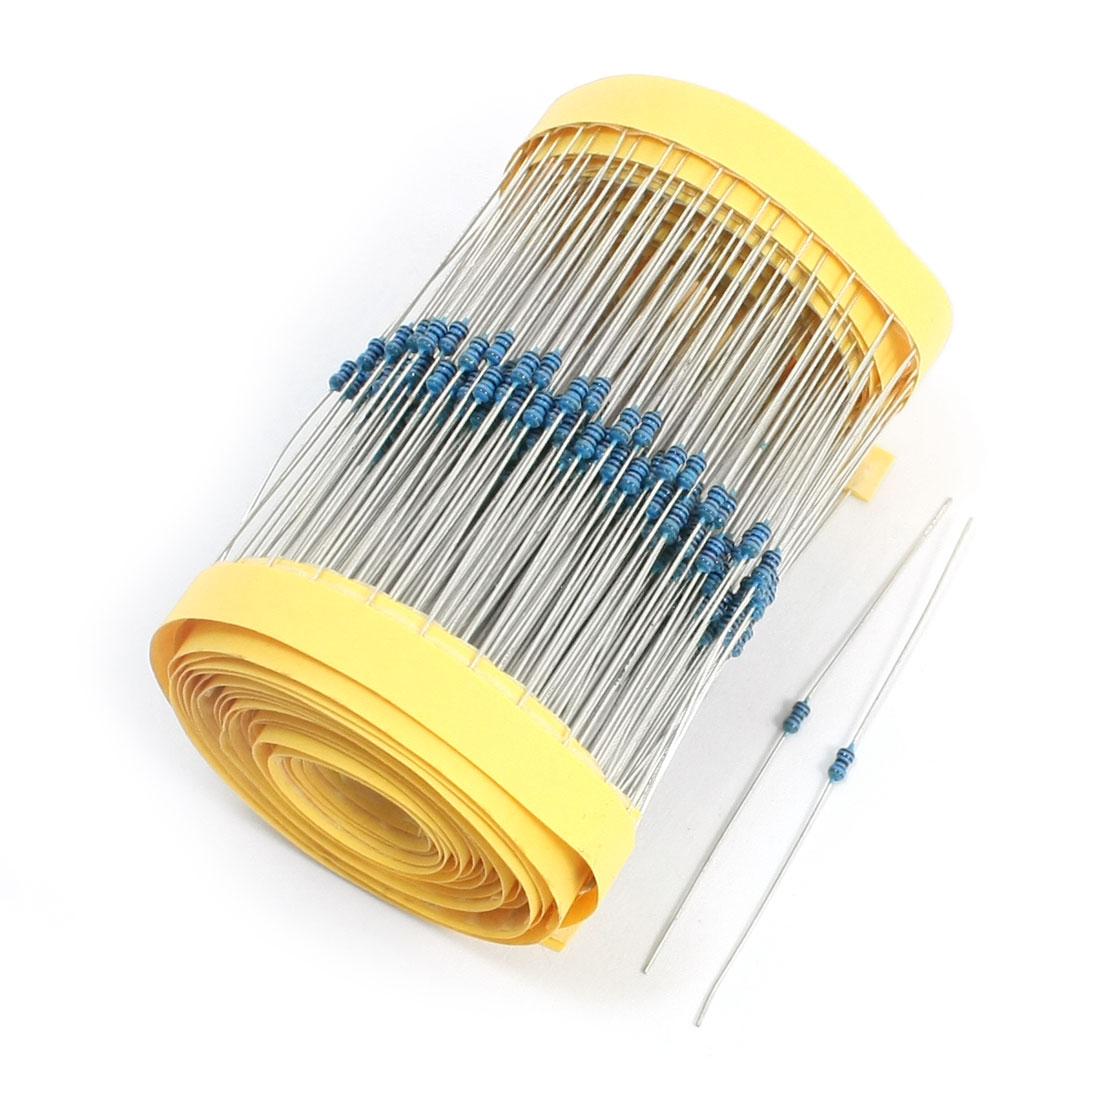 600Pieces 1/8W 8.2K Ohm Axial Lead Through Hole Metal Film Resistor 1%